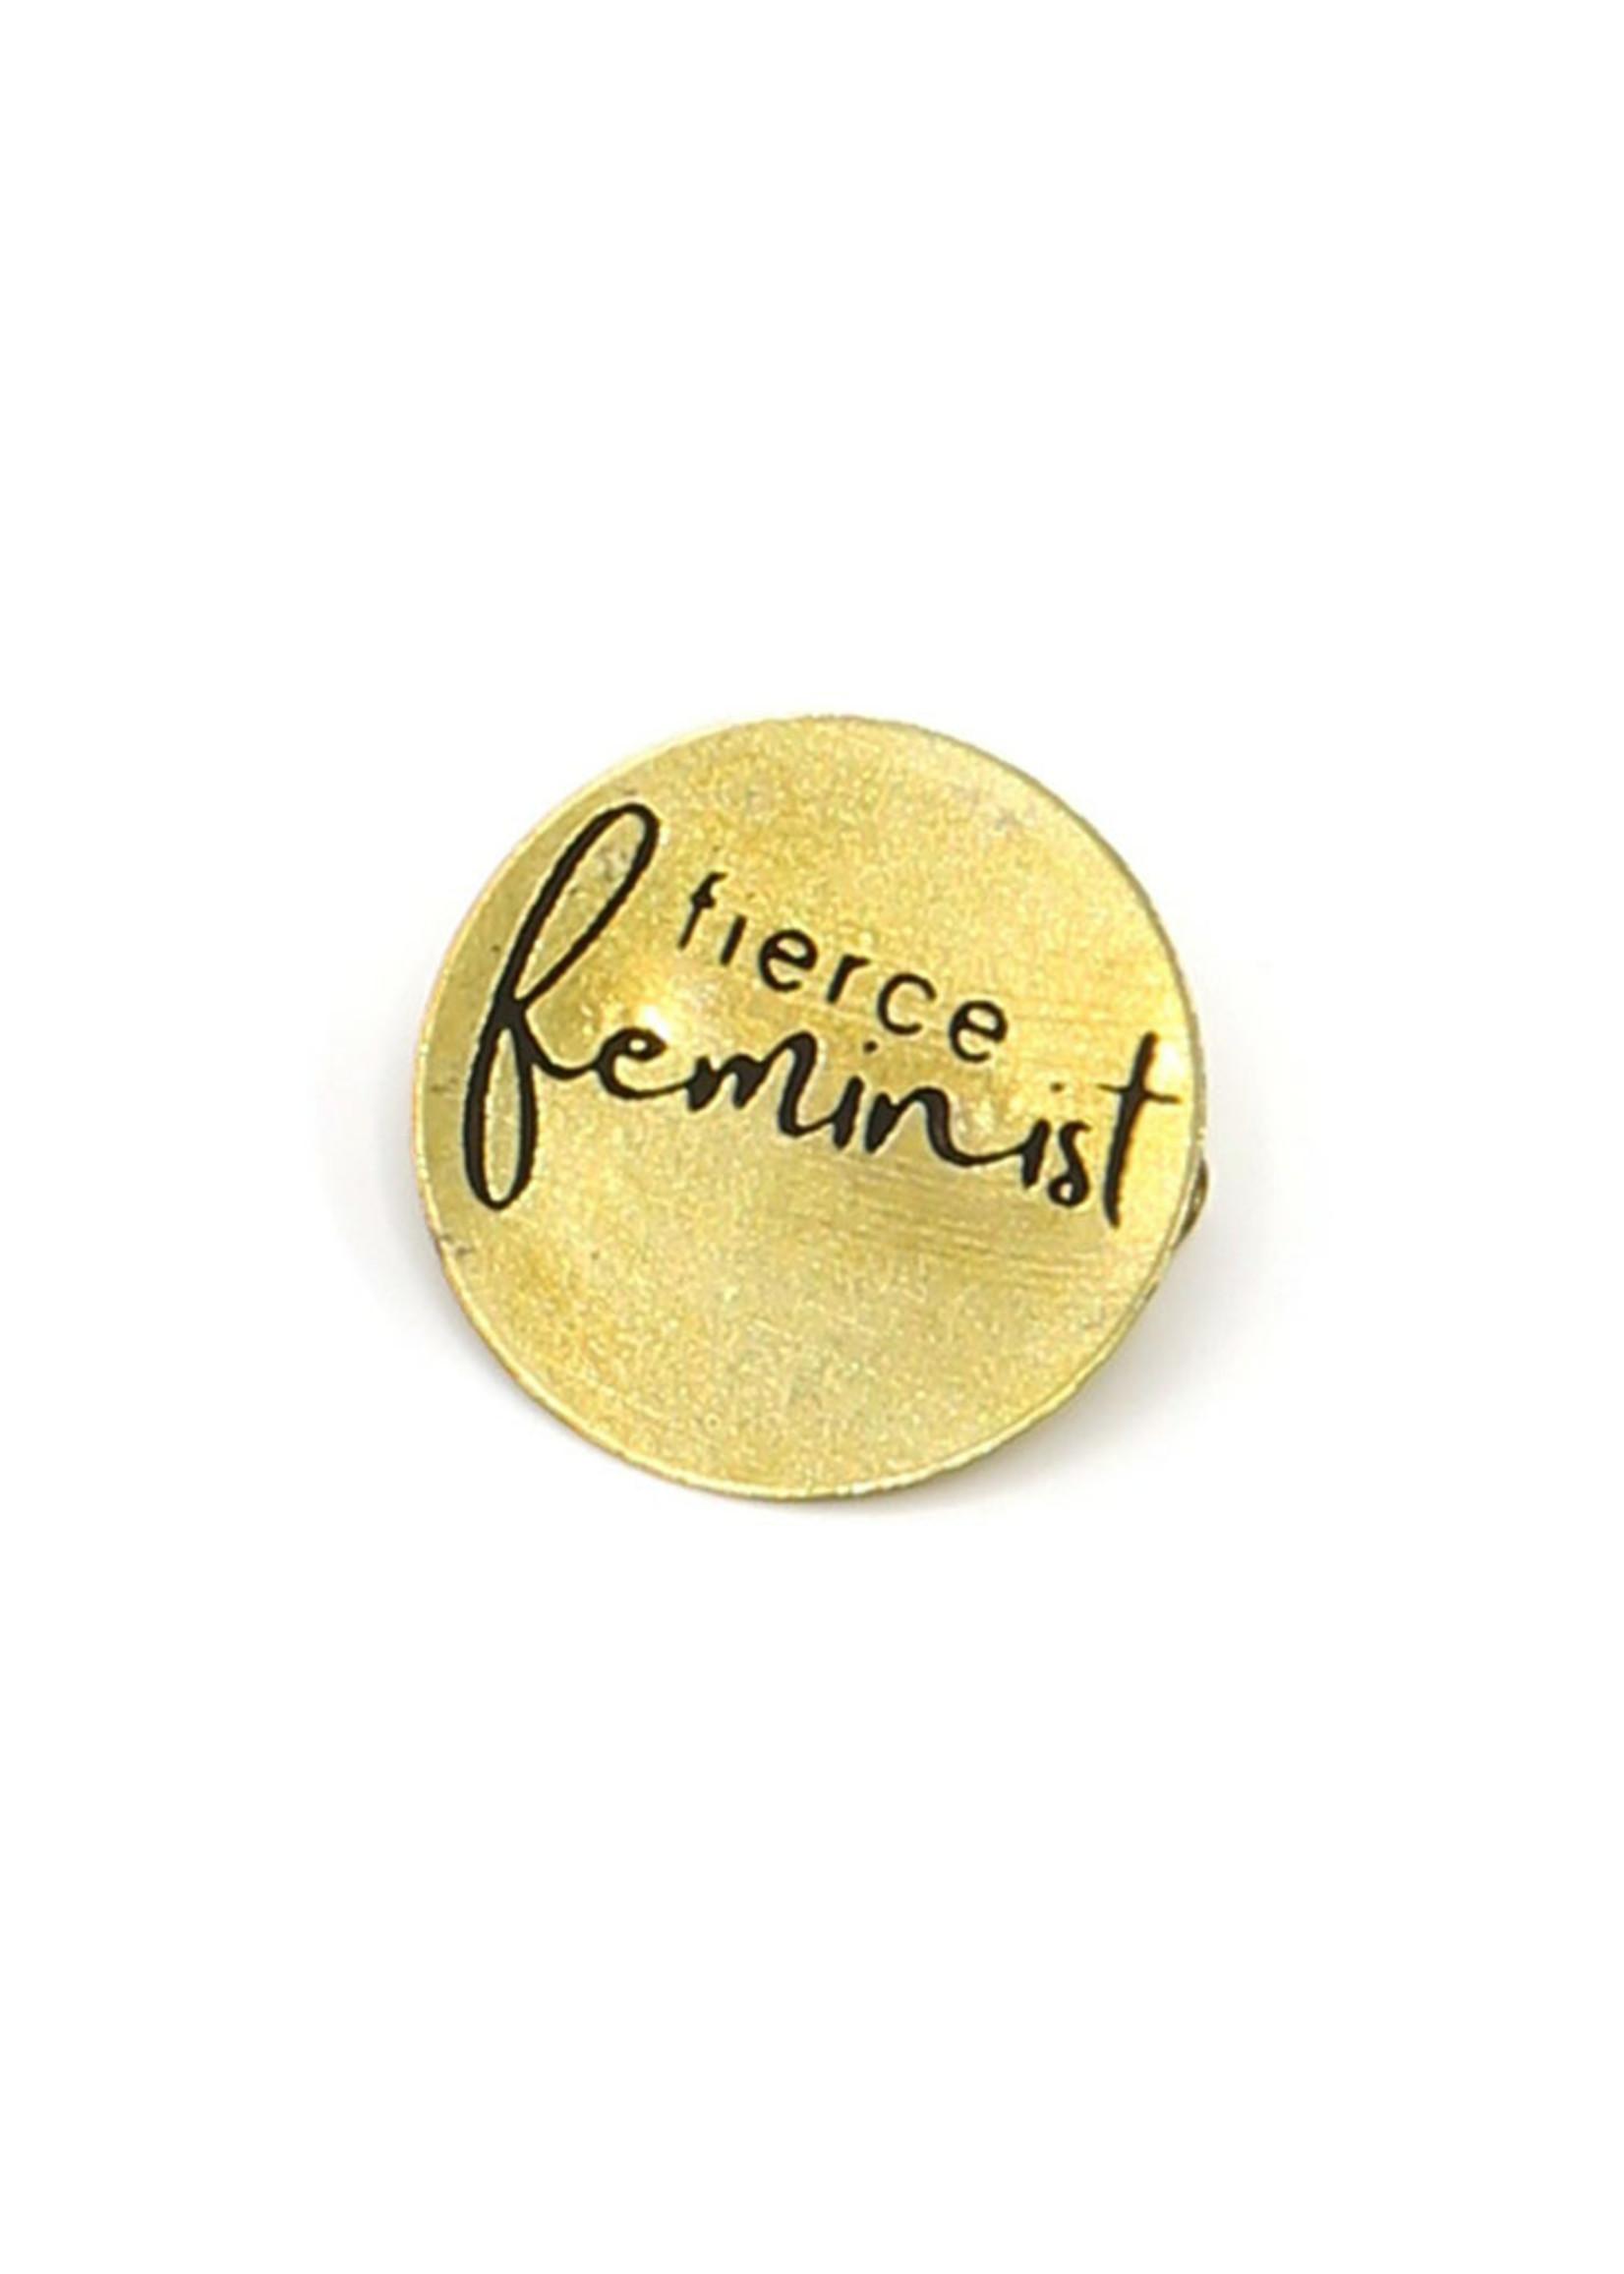 Fierce Feminist Pin